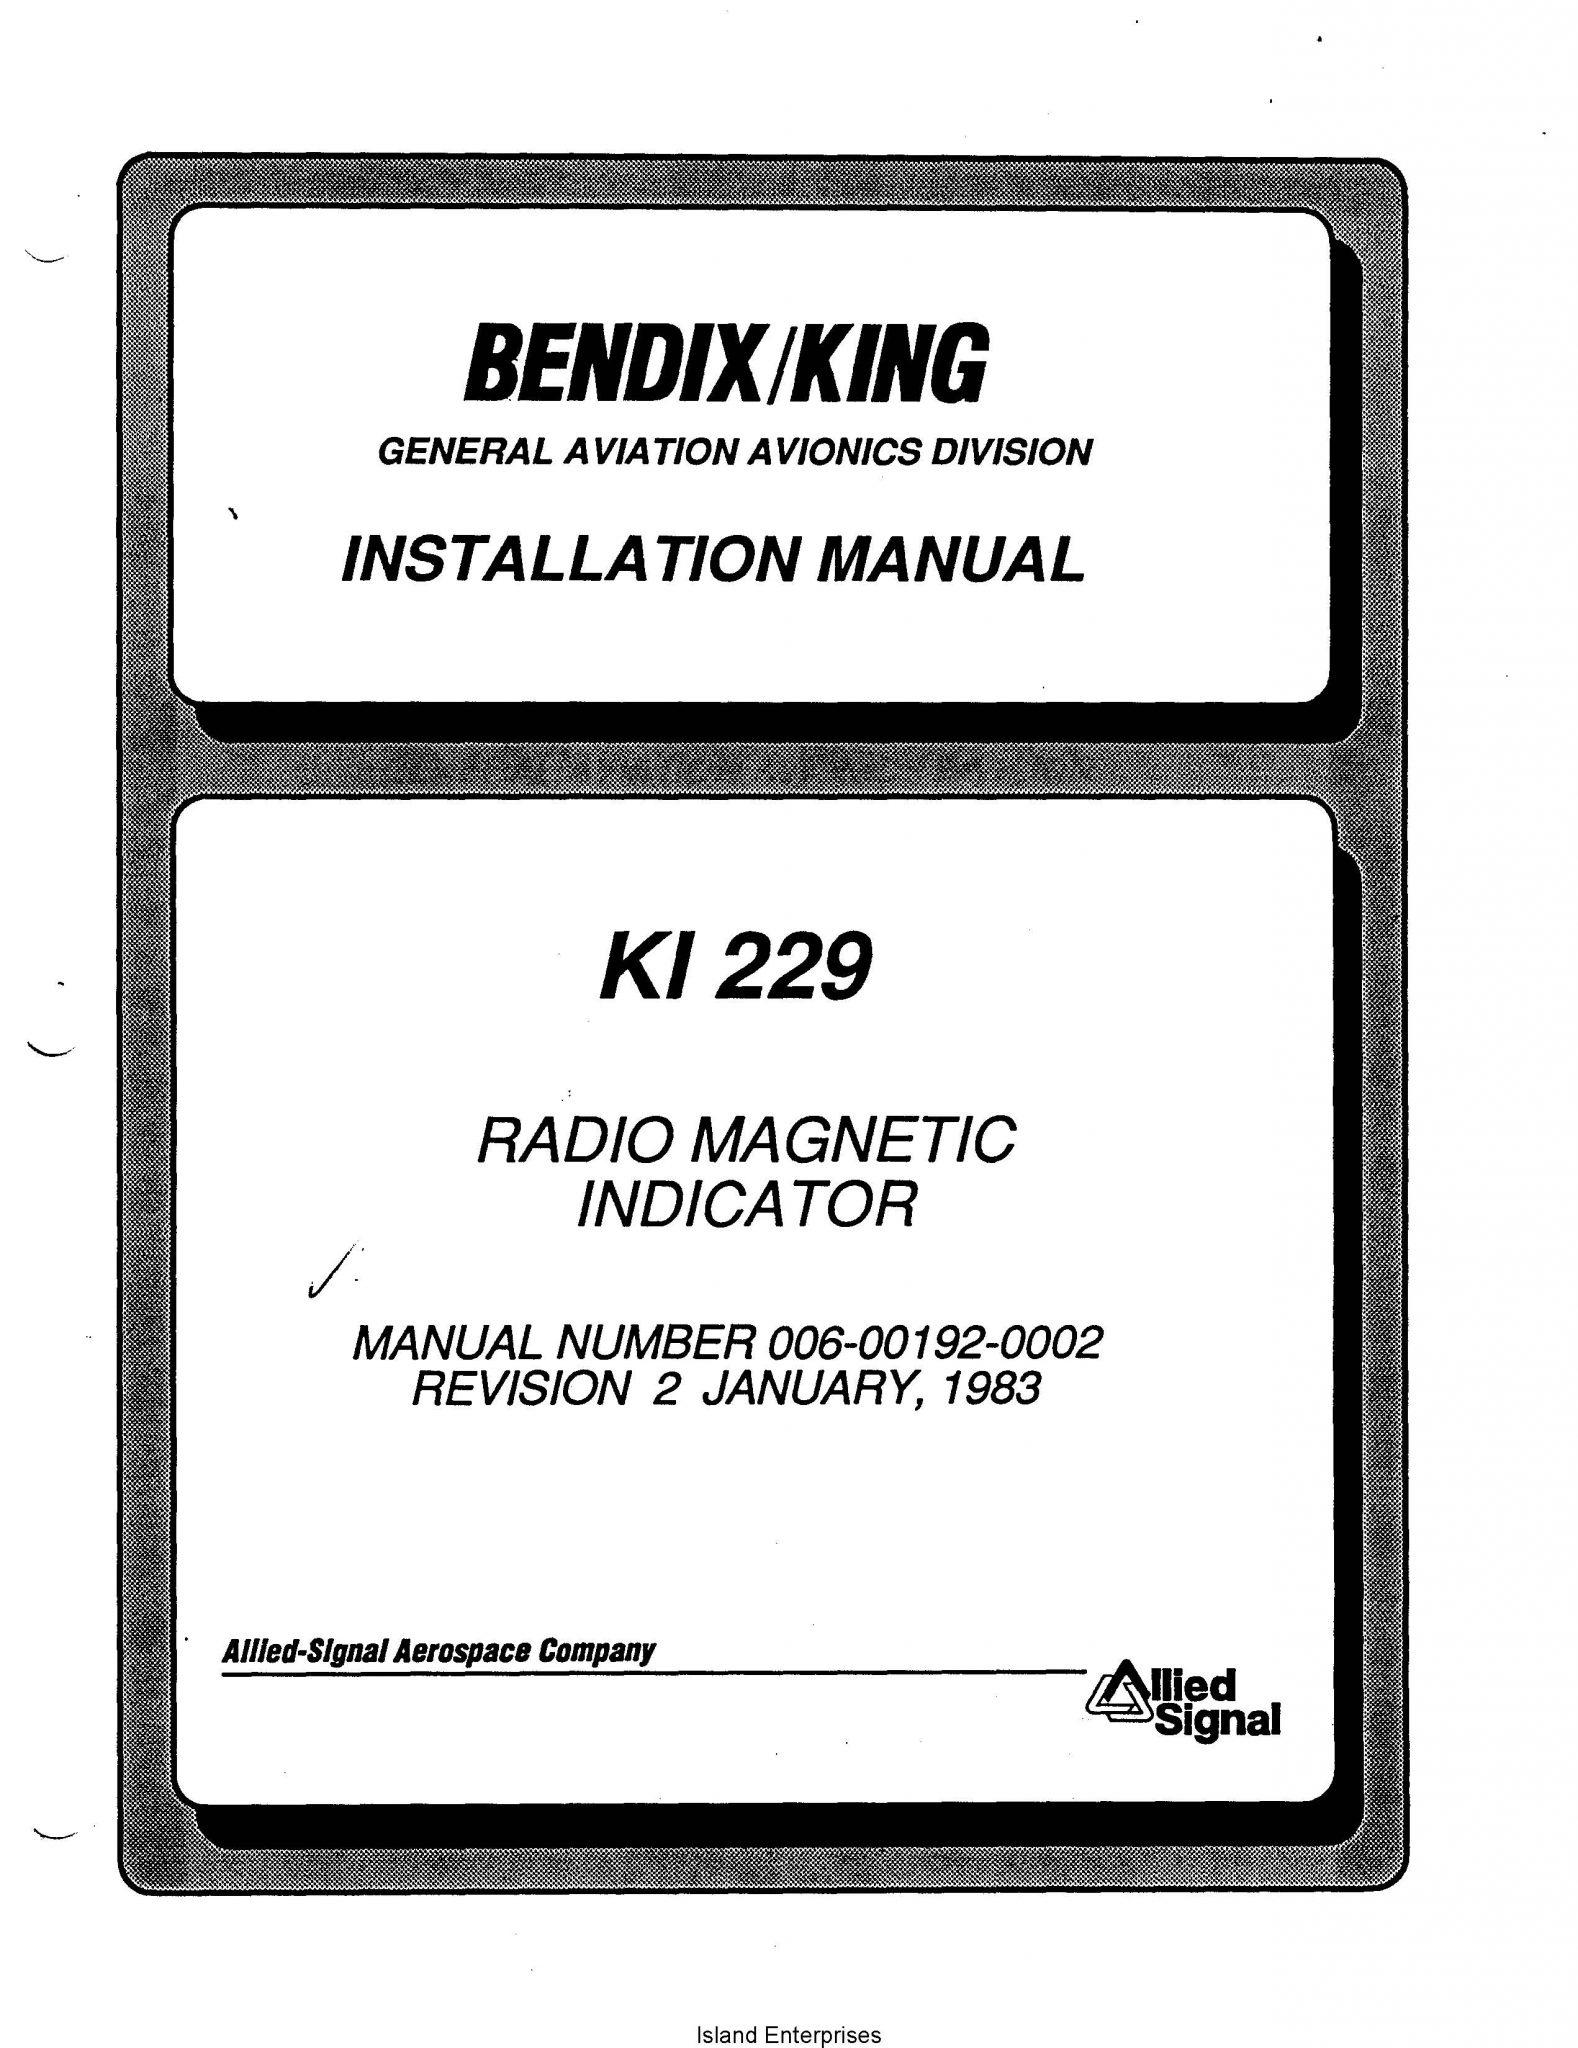 Bendix king kln 94 avionics quick reference book manual by qref p.